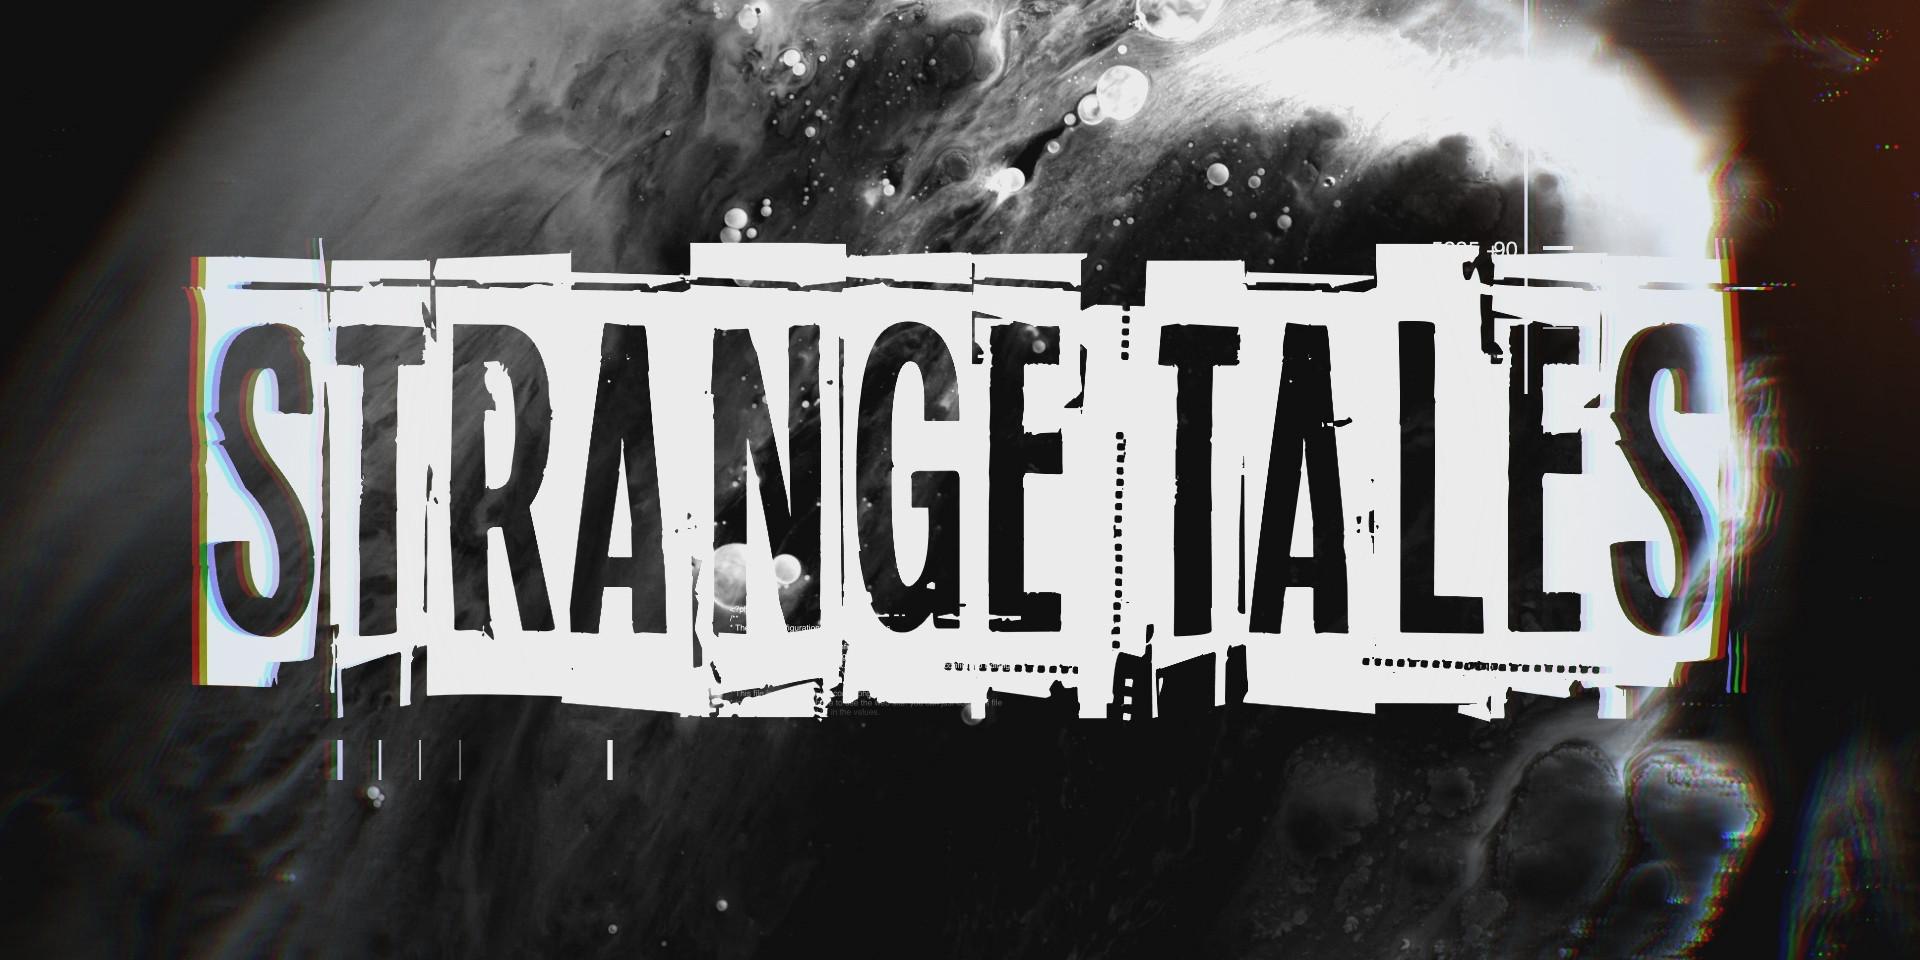 Strange Ta;es